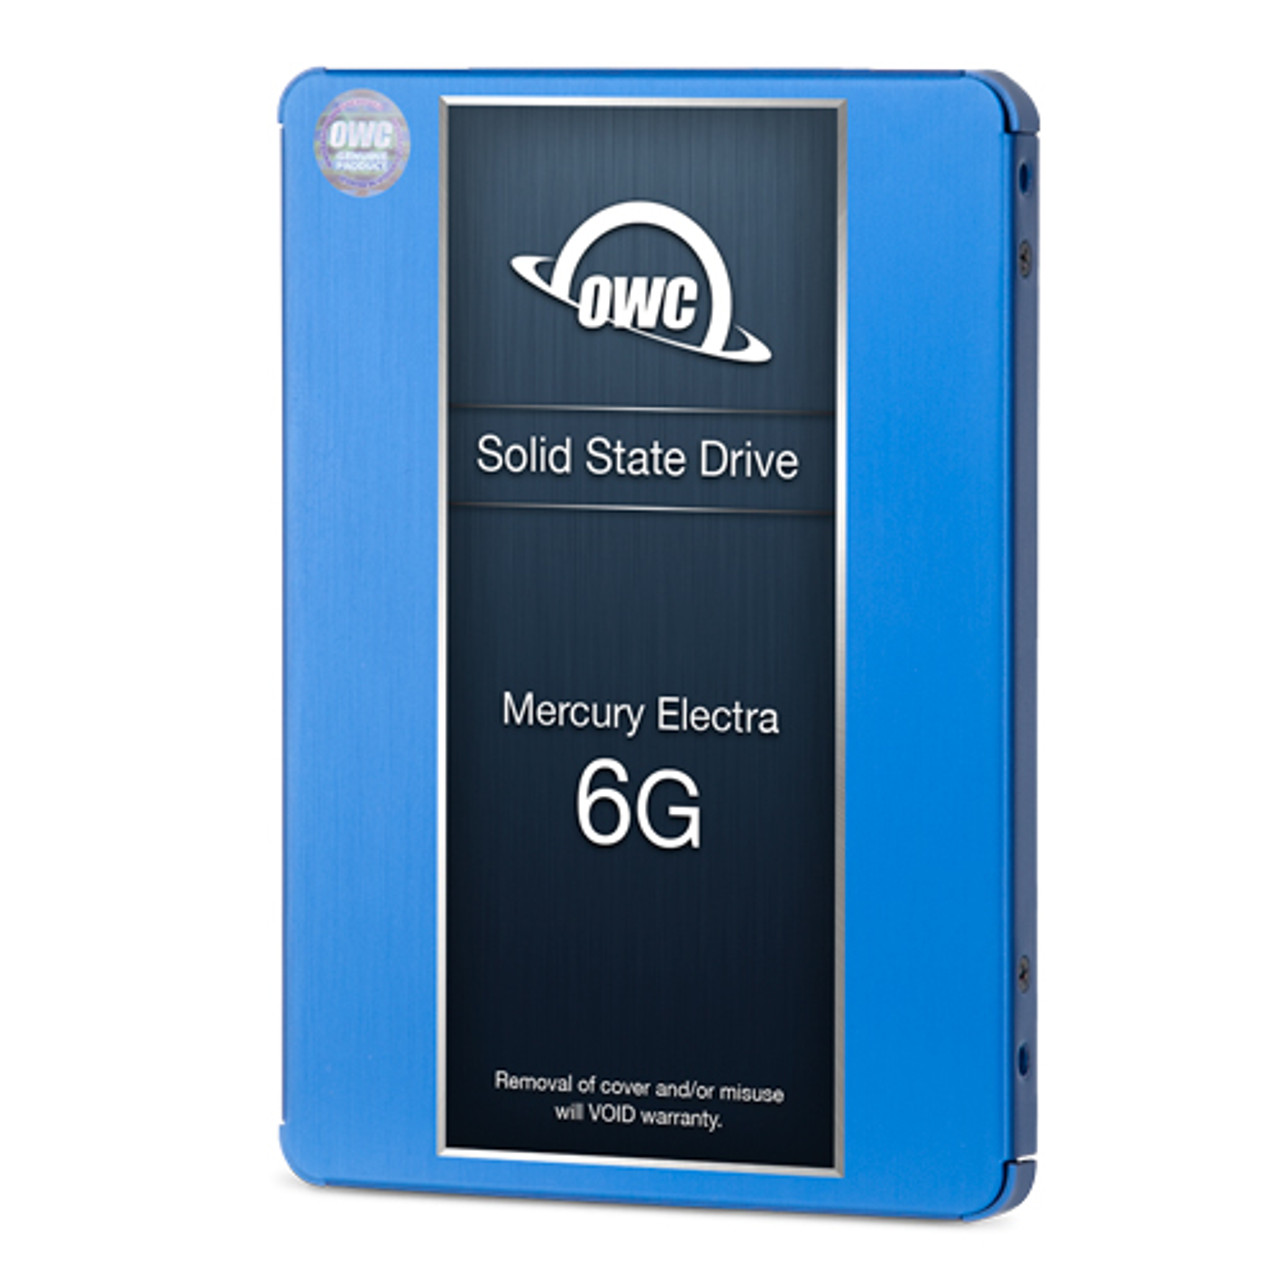 500GB OWC Mercury Electra 6G SSD - SSD Bay Add-In Kit for 2011 21.5-inch iMacs